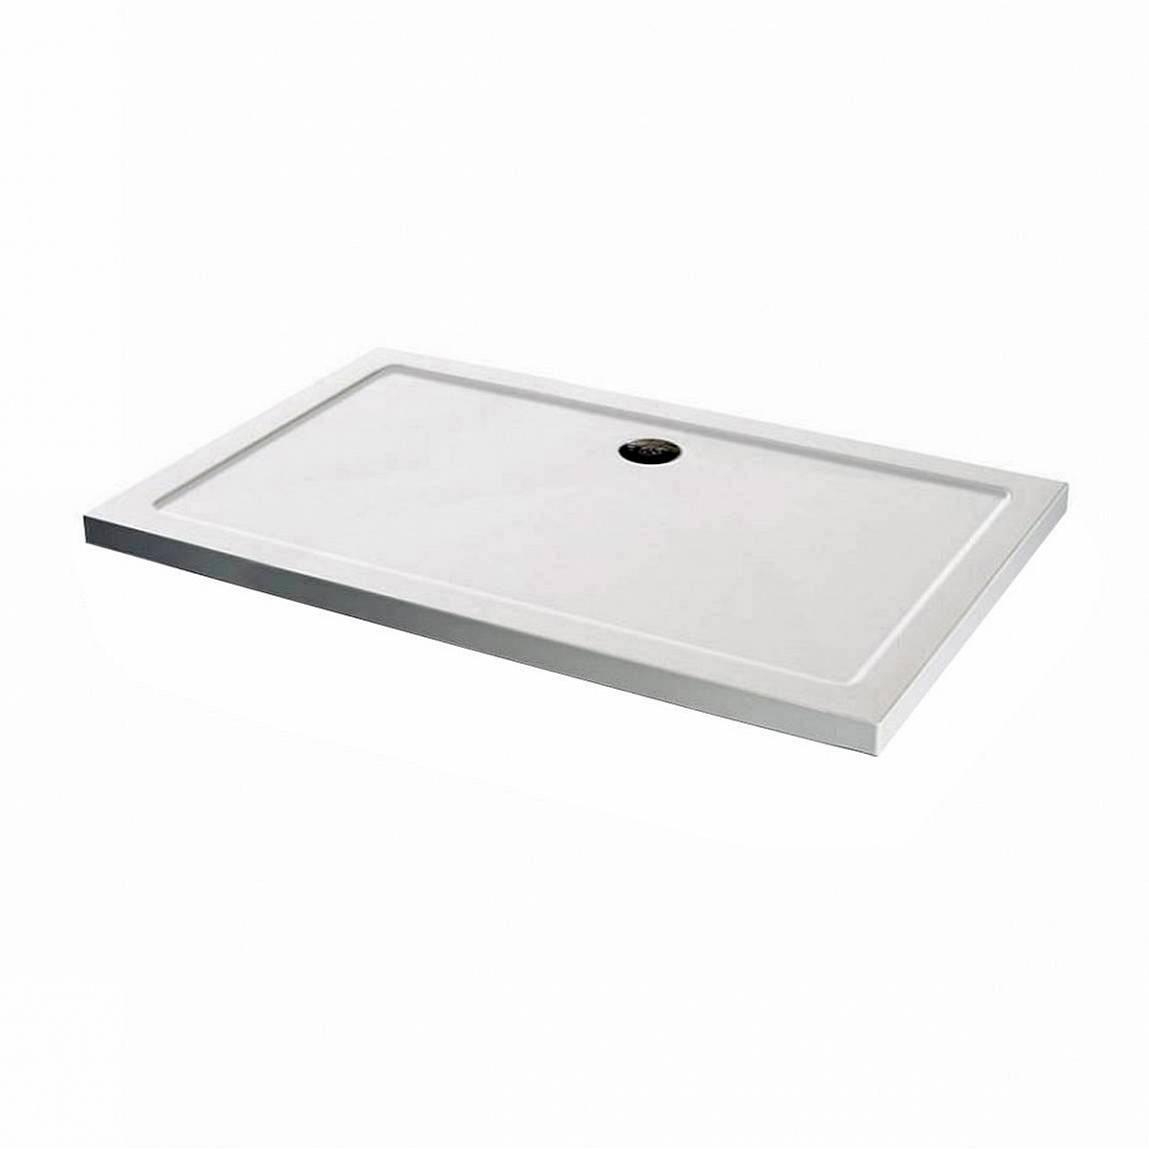 Image of Rectangular Stone Shower Tray 1700 x 750